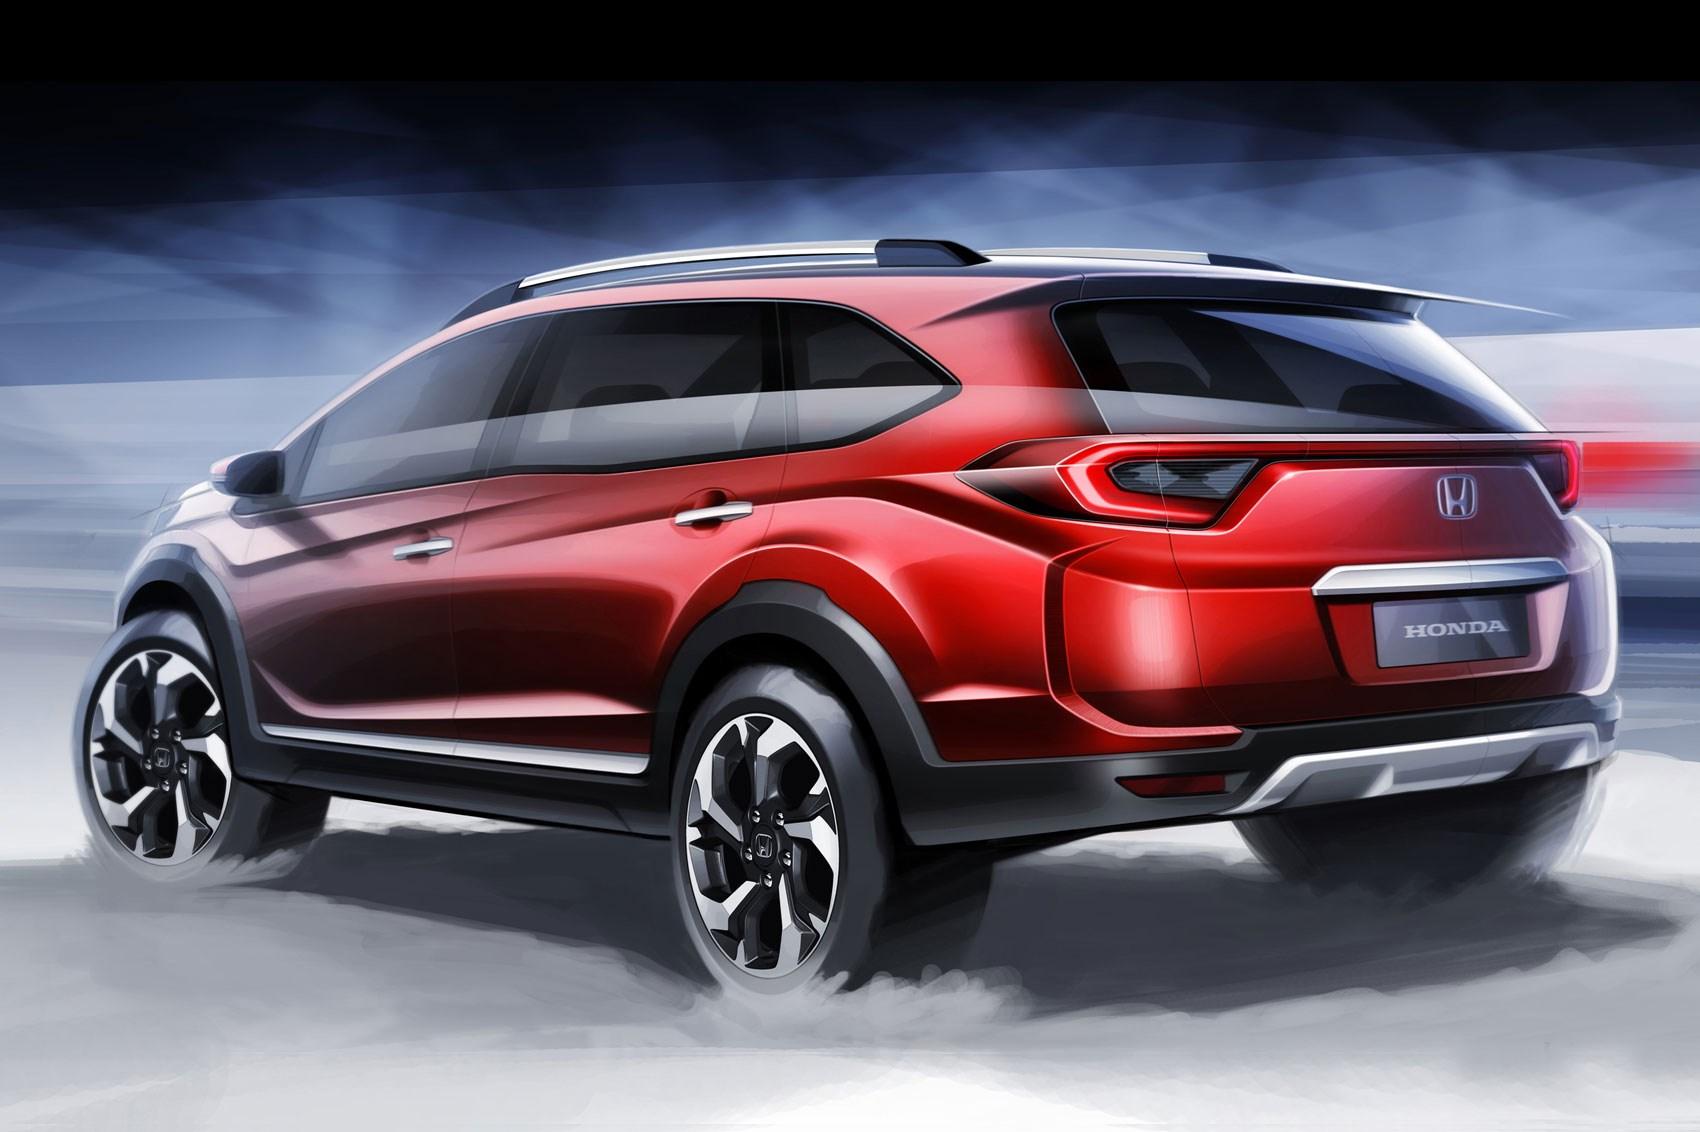 2016 Honda BR-V Concept